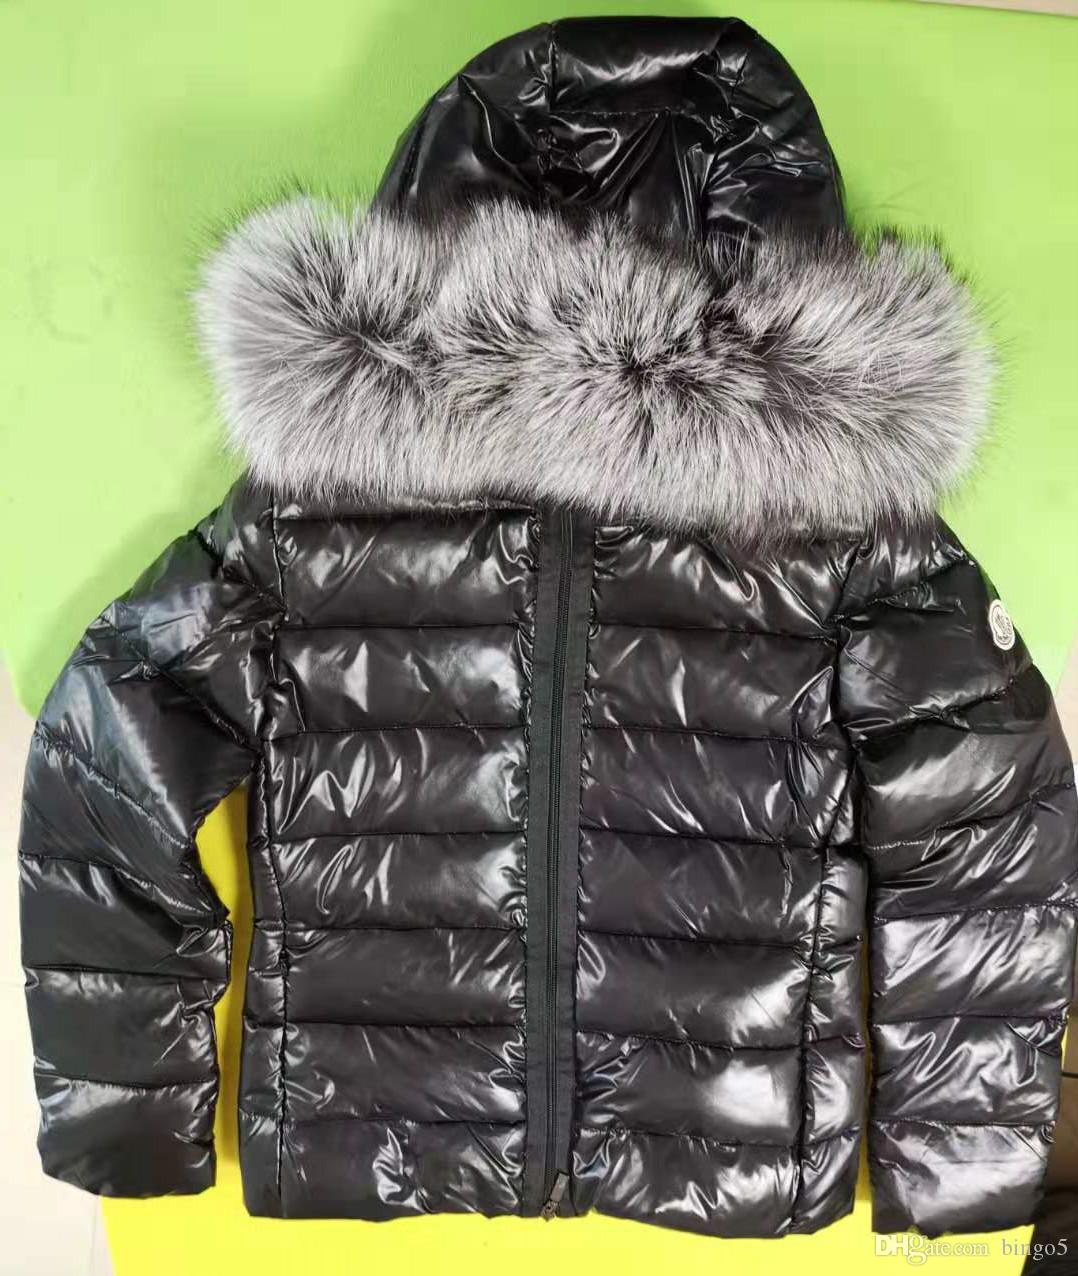 Marca Mulheres Fox Fur Belt Duck Down Jacket Designer Mulheres Zipper Casaco Quente de Inverno Com Capuz Curto